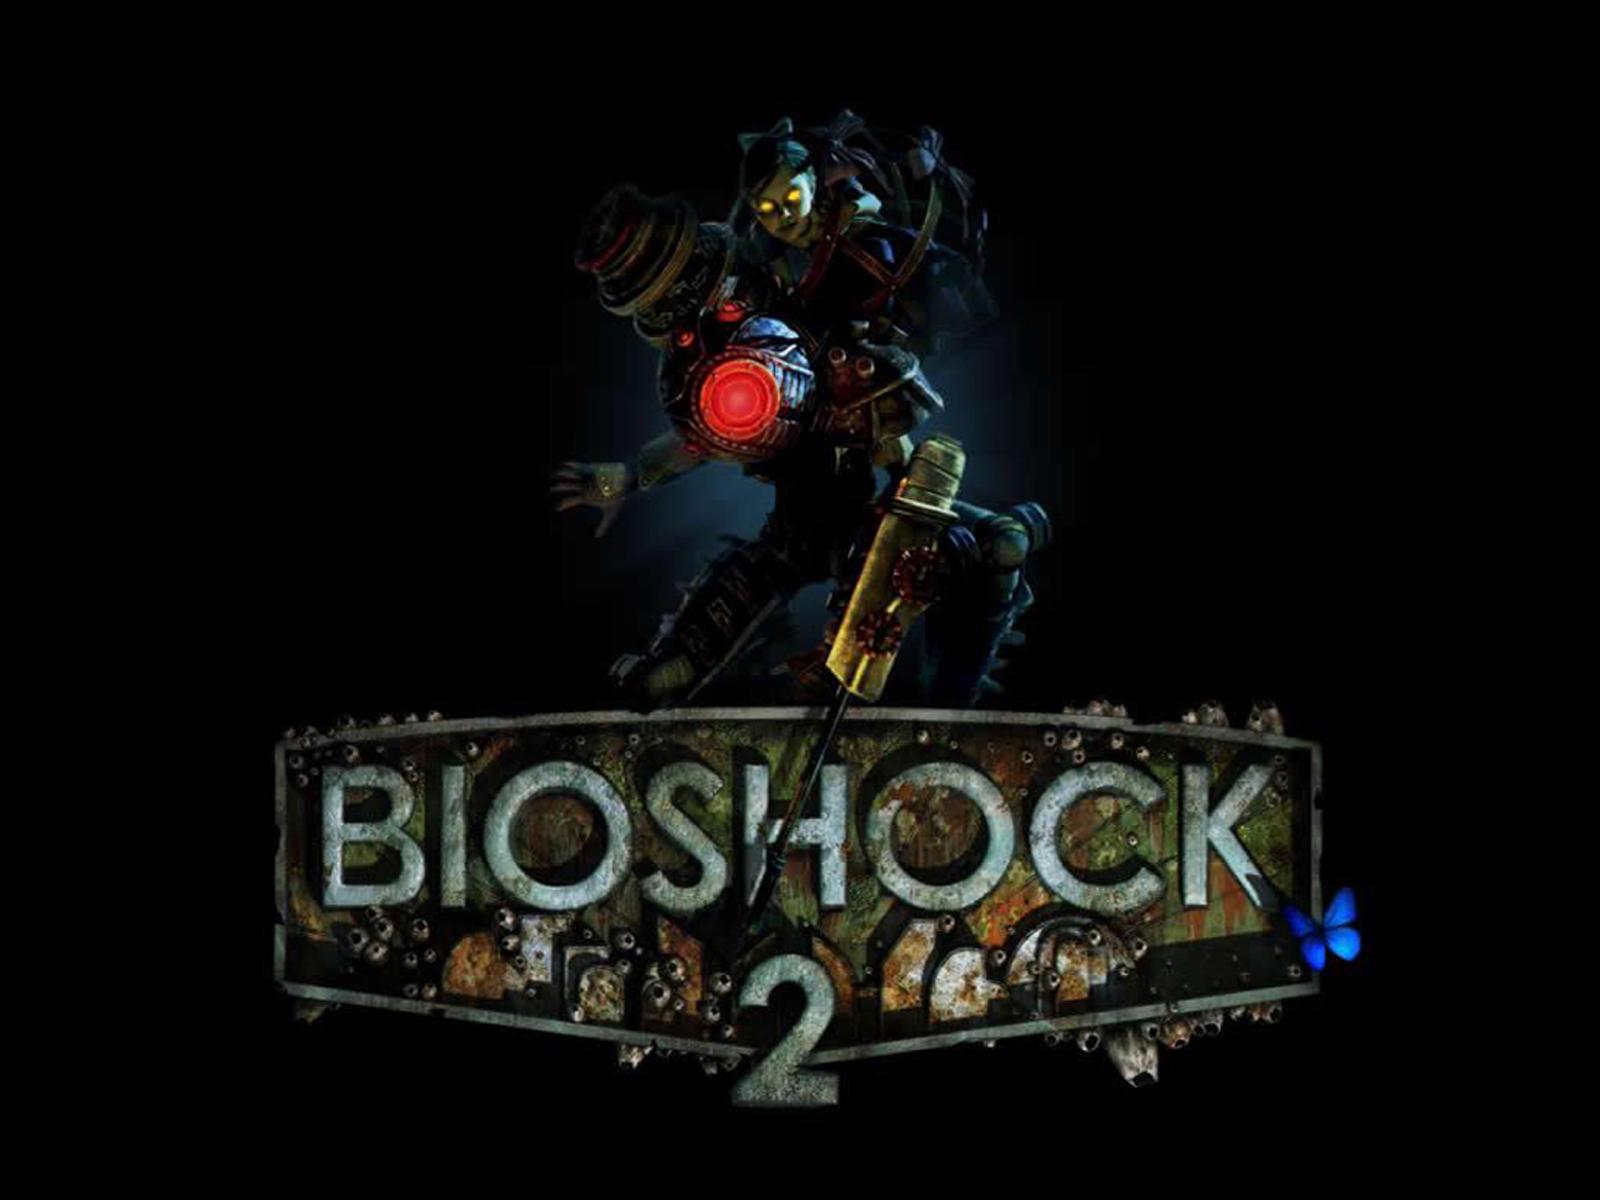 http://3.bp.blogspot.com/-Z2MvUOmVrkA/TnZPHXxKvdI/AAAAAAAABIo/grv7hvtaqYg/s1600/BioShock_2_little_sister_logo_game_widescreenwallpapersbox.blogspot.com.jpg